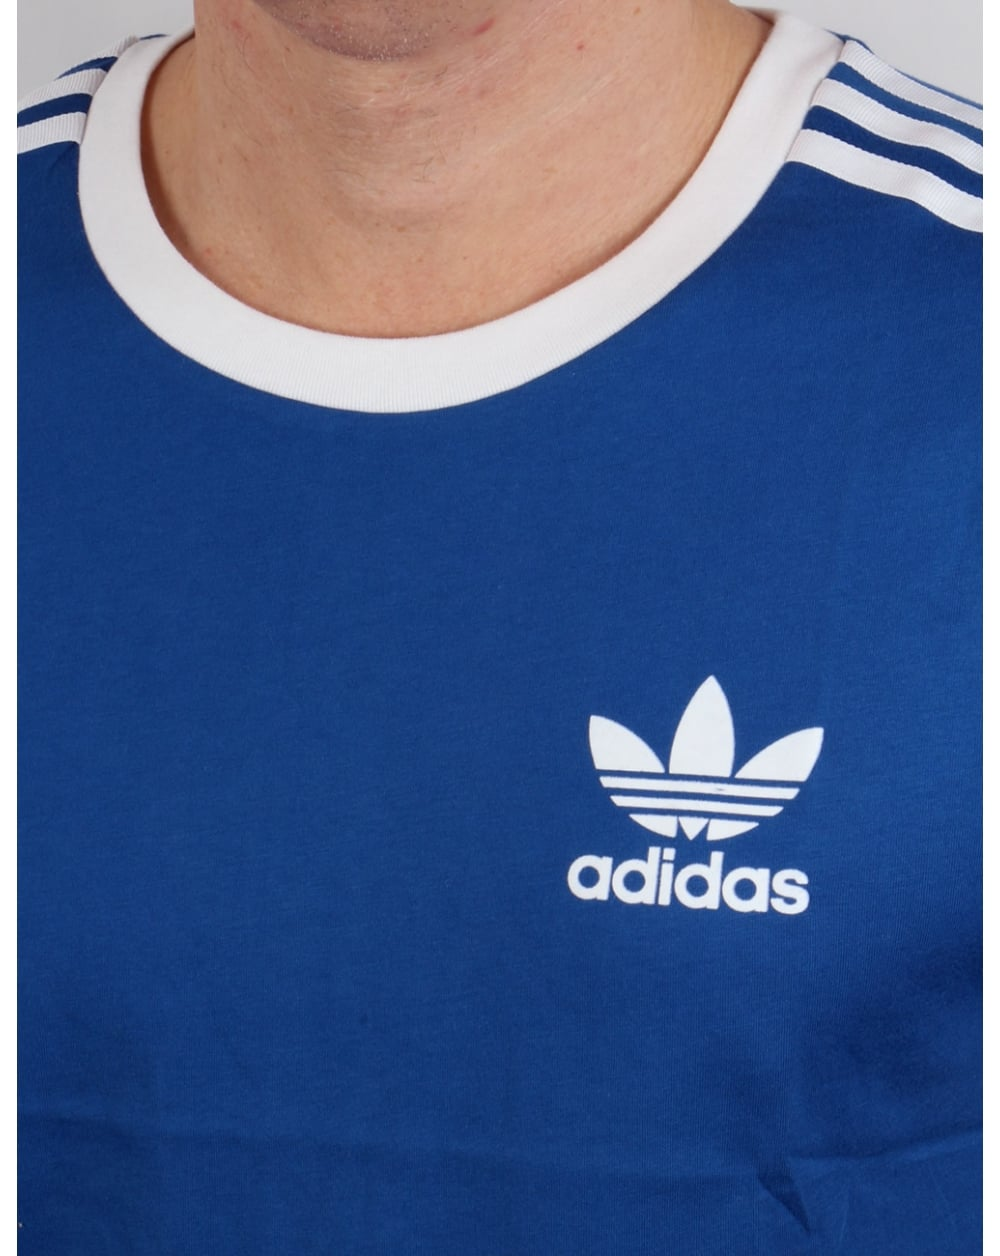 adidas originals white 3 stripe trefoil retro t-shirt